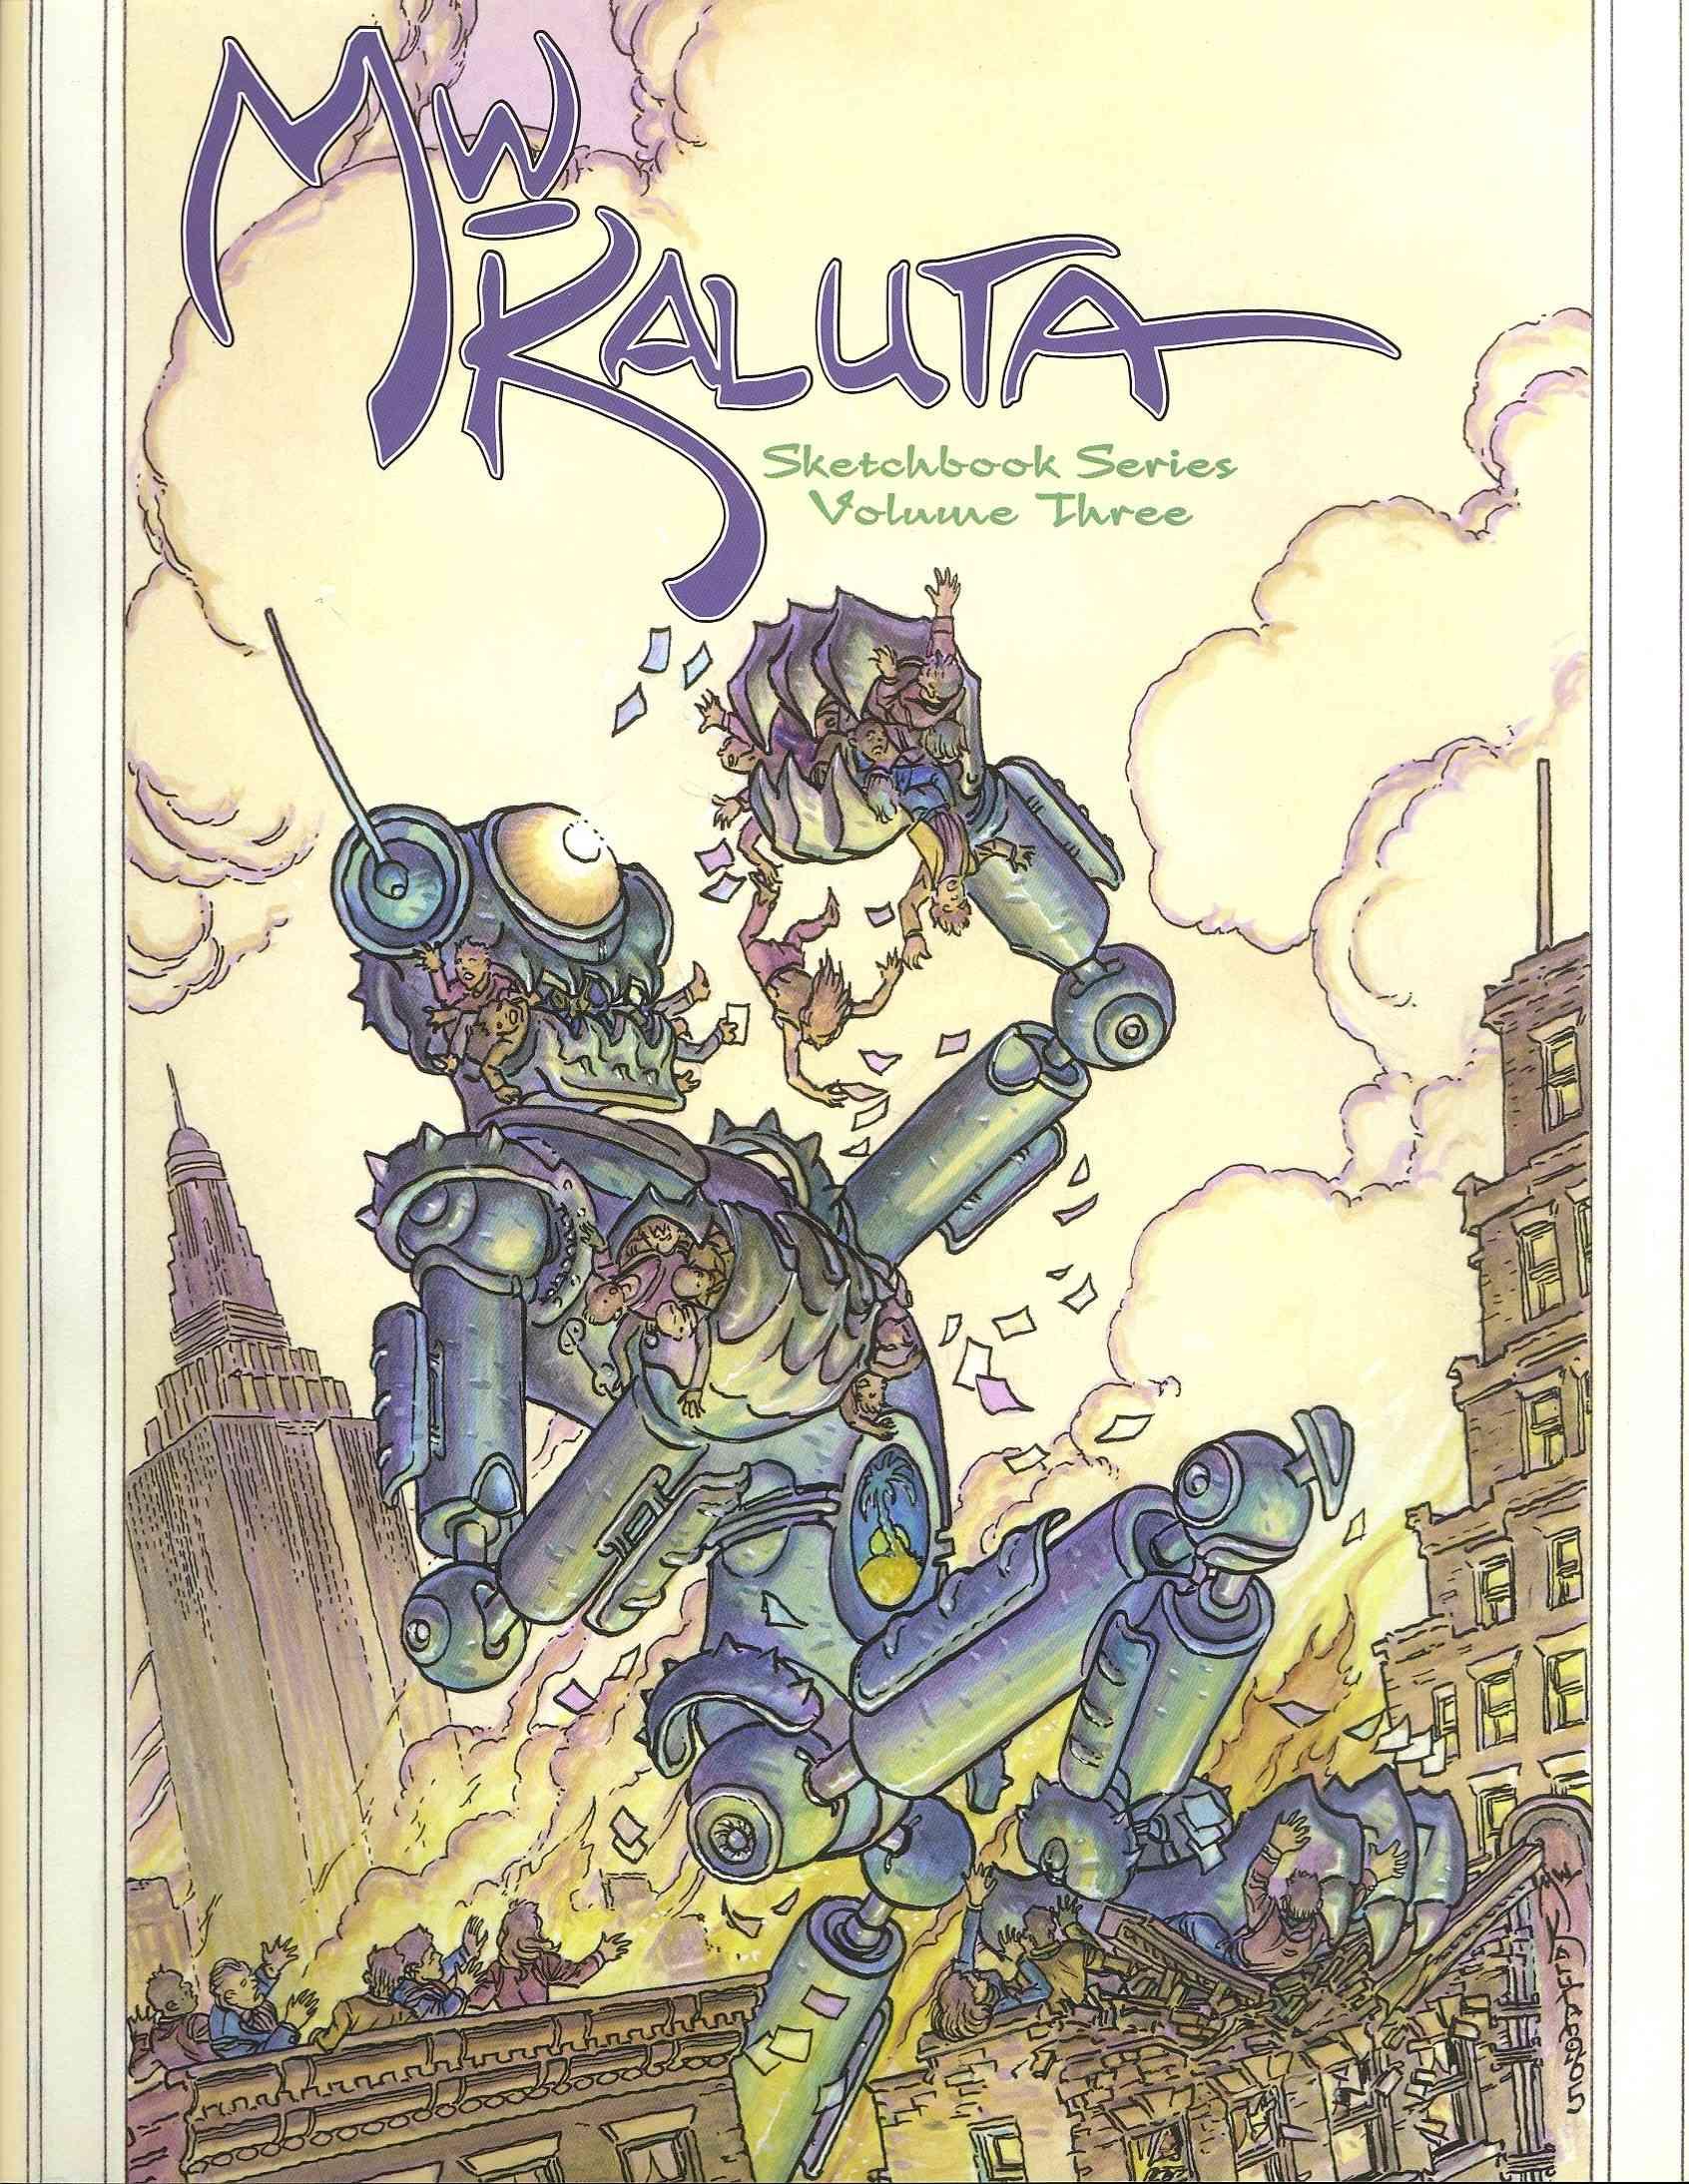 Michael Wm. Kaluta (Paperback)